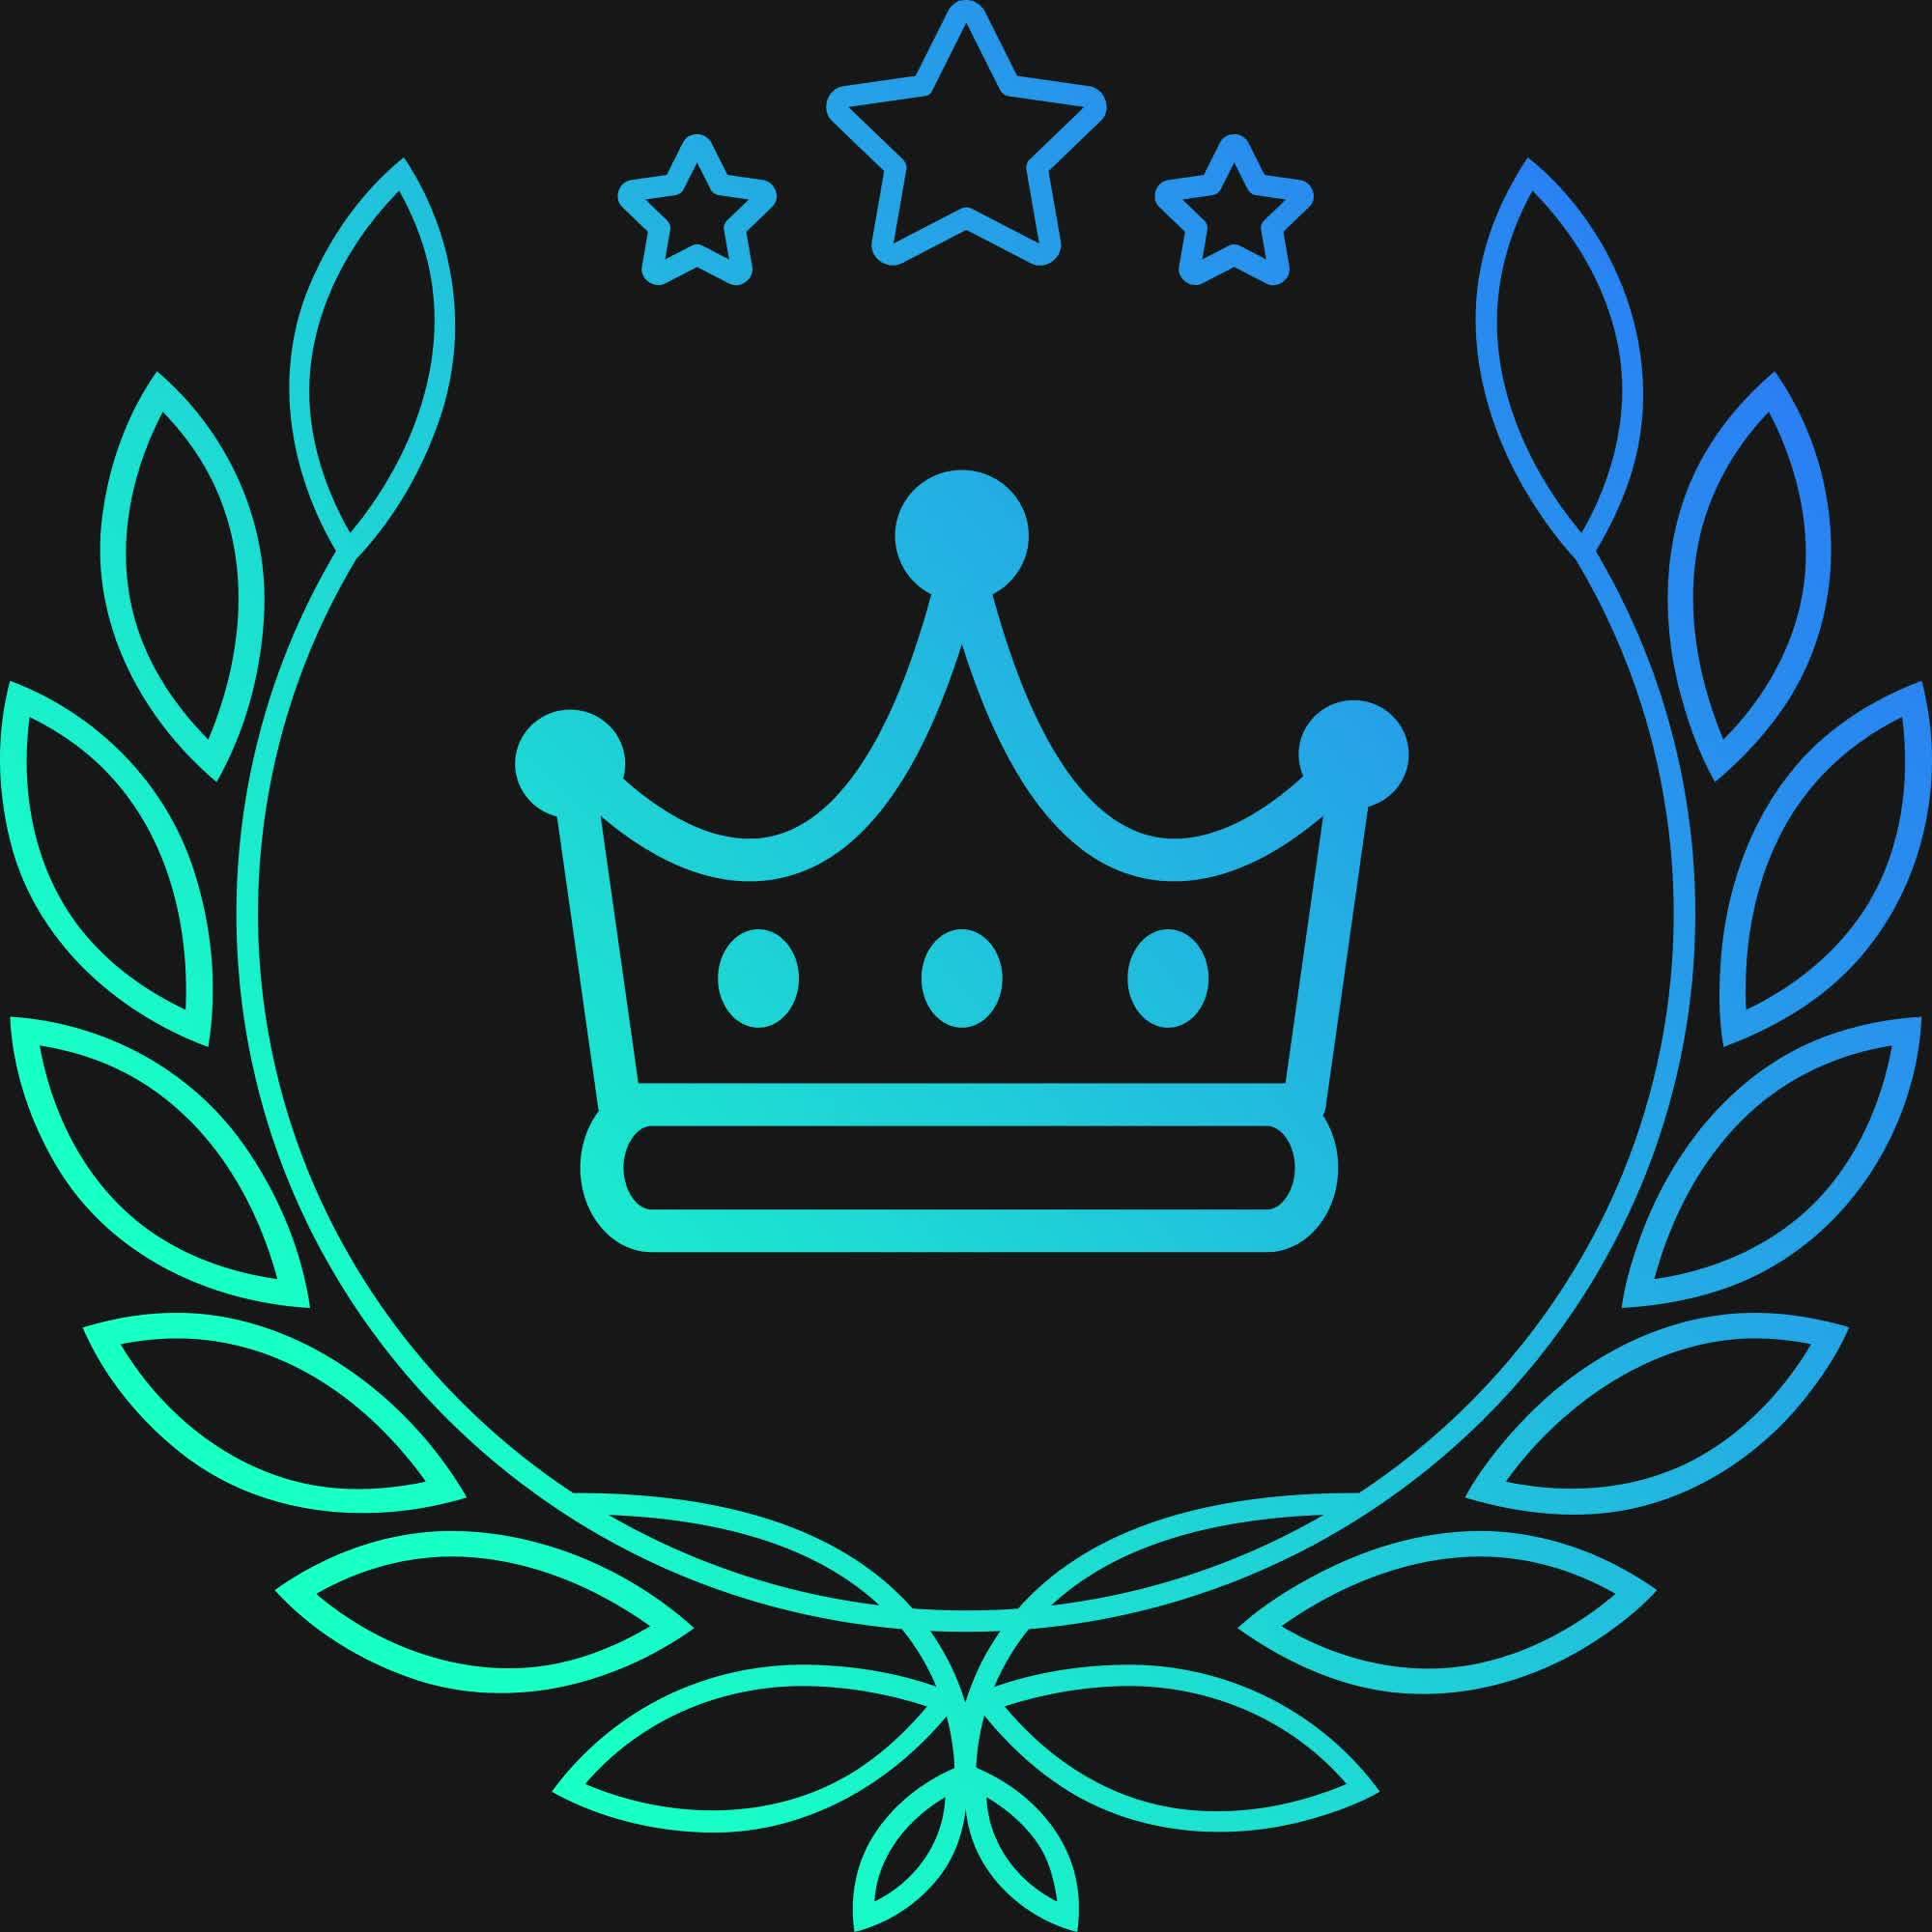 crown, gfycat, gfycat pro, Gfycat Pro Crown GIFs